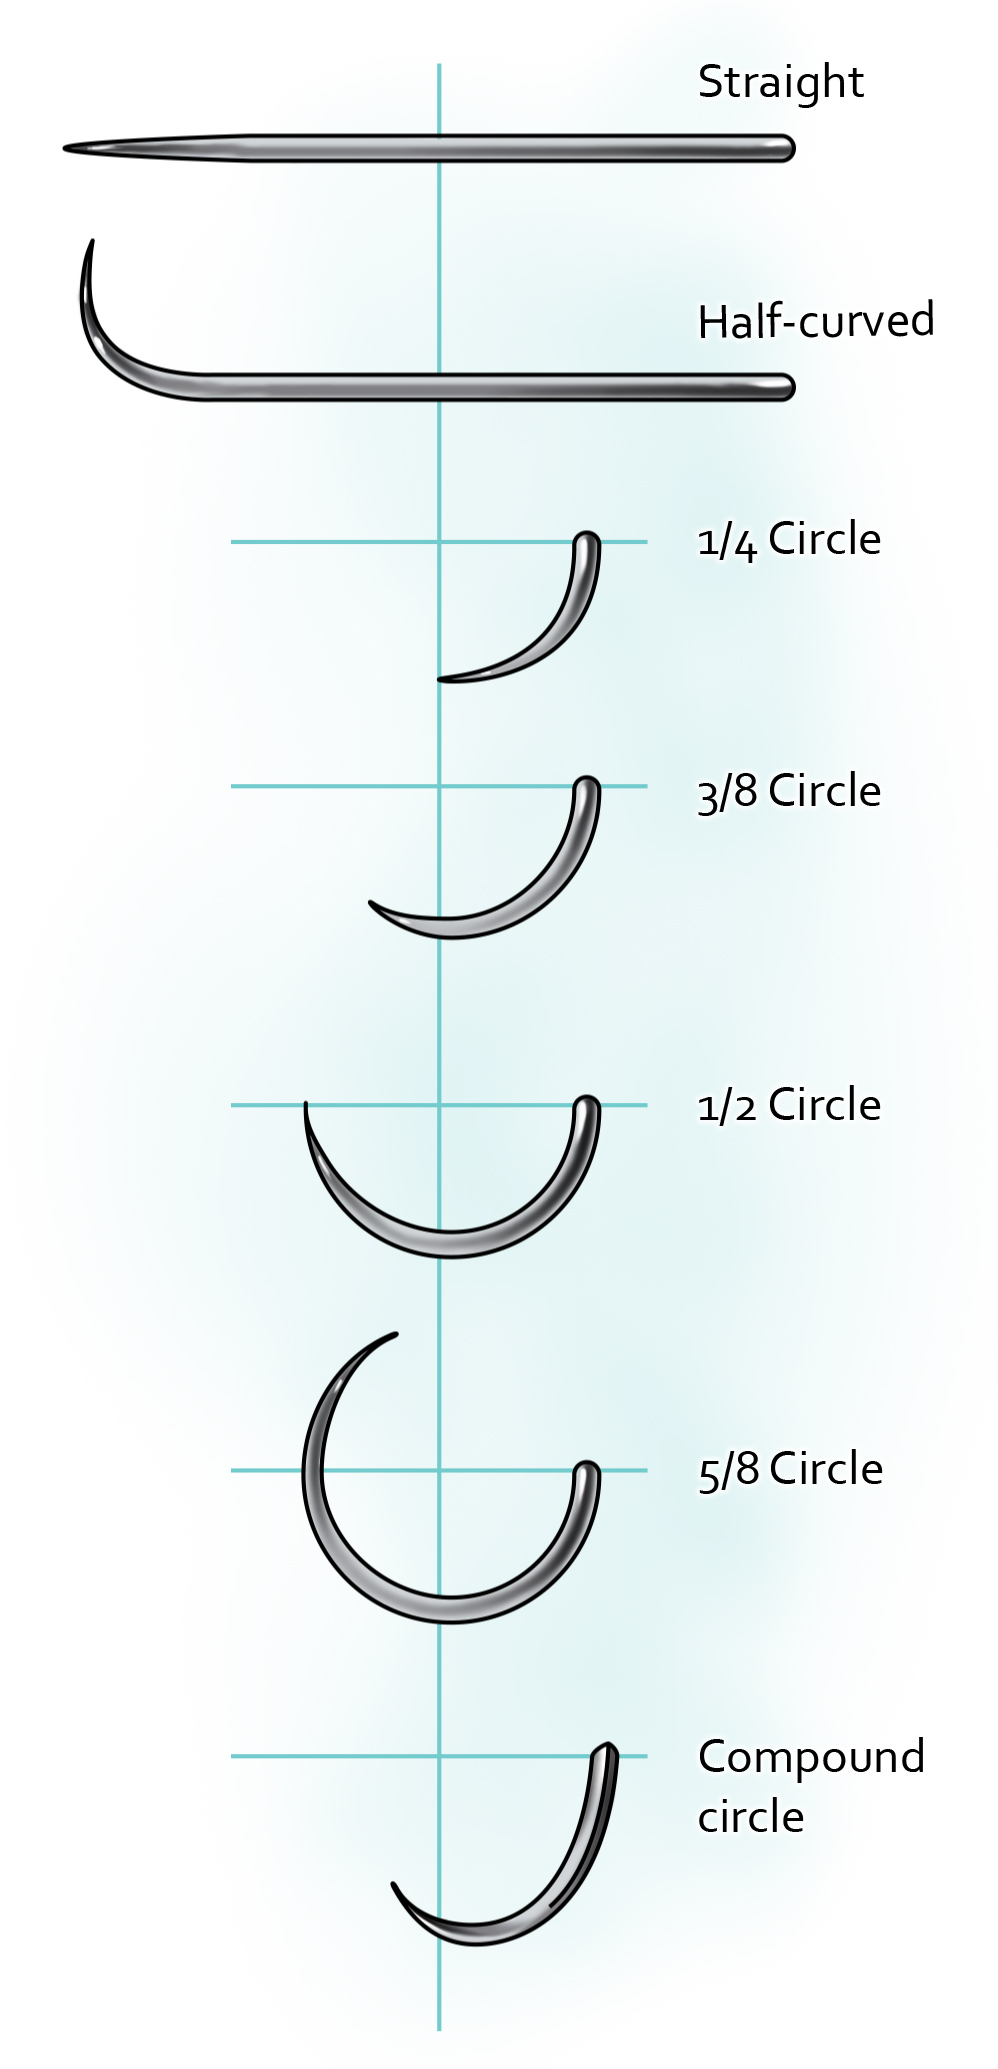 Figure 2: Needle shapes.